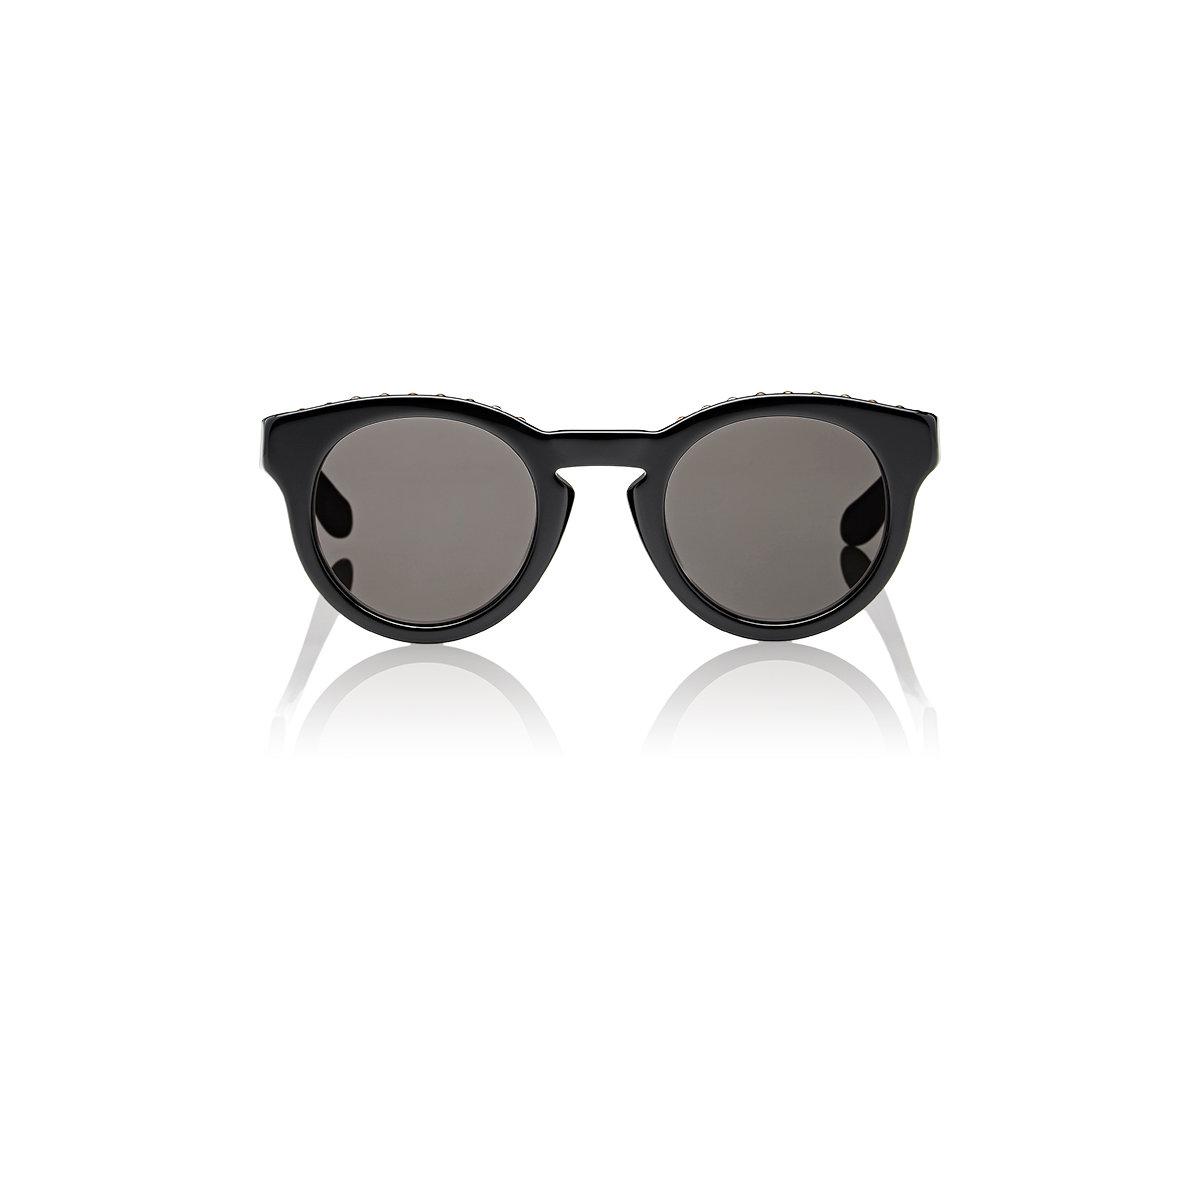 3bd672ed1c Lyst - Givenchy Stud-embellished Round Sunglasses